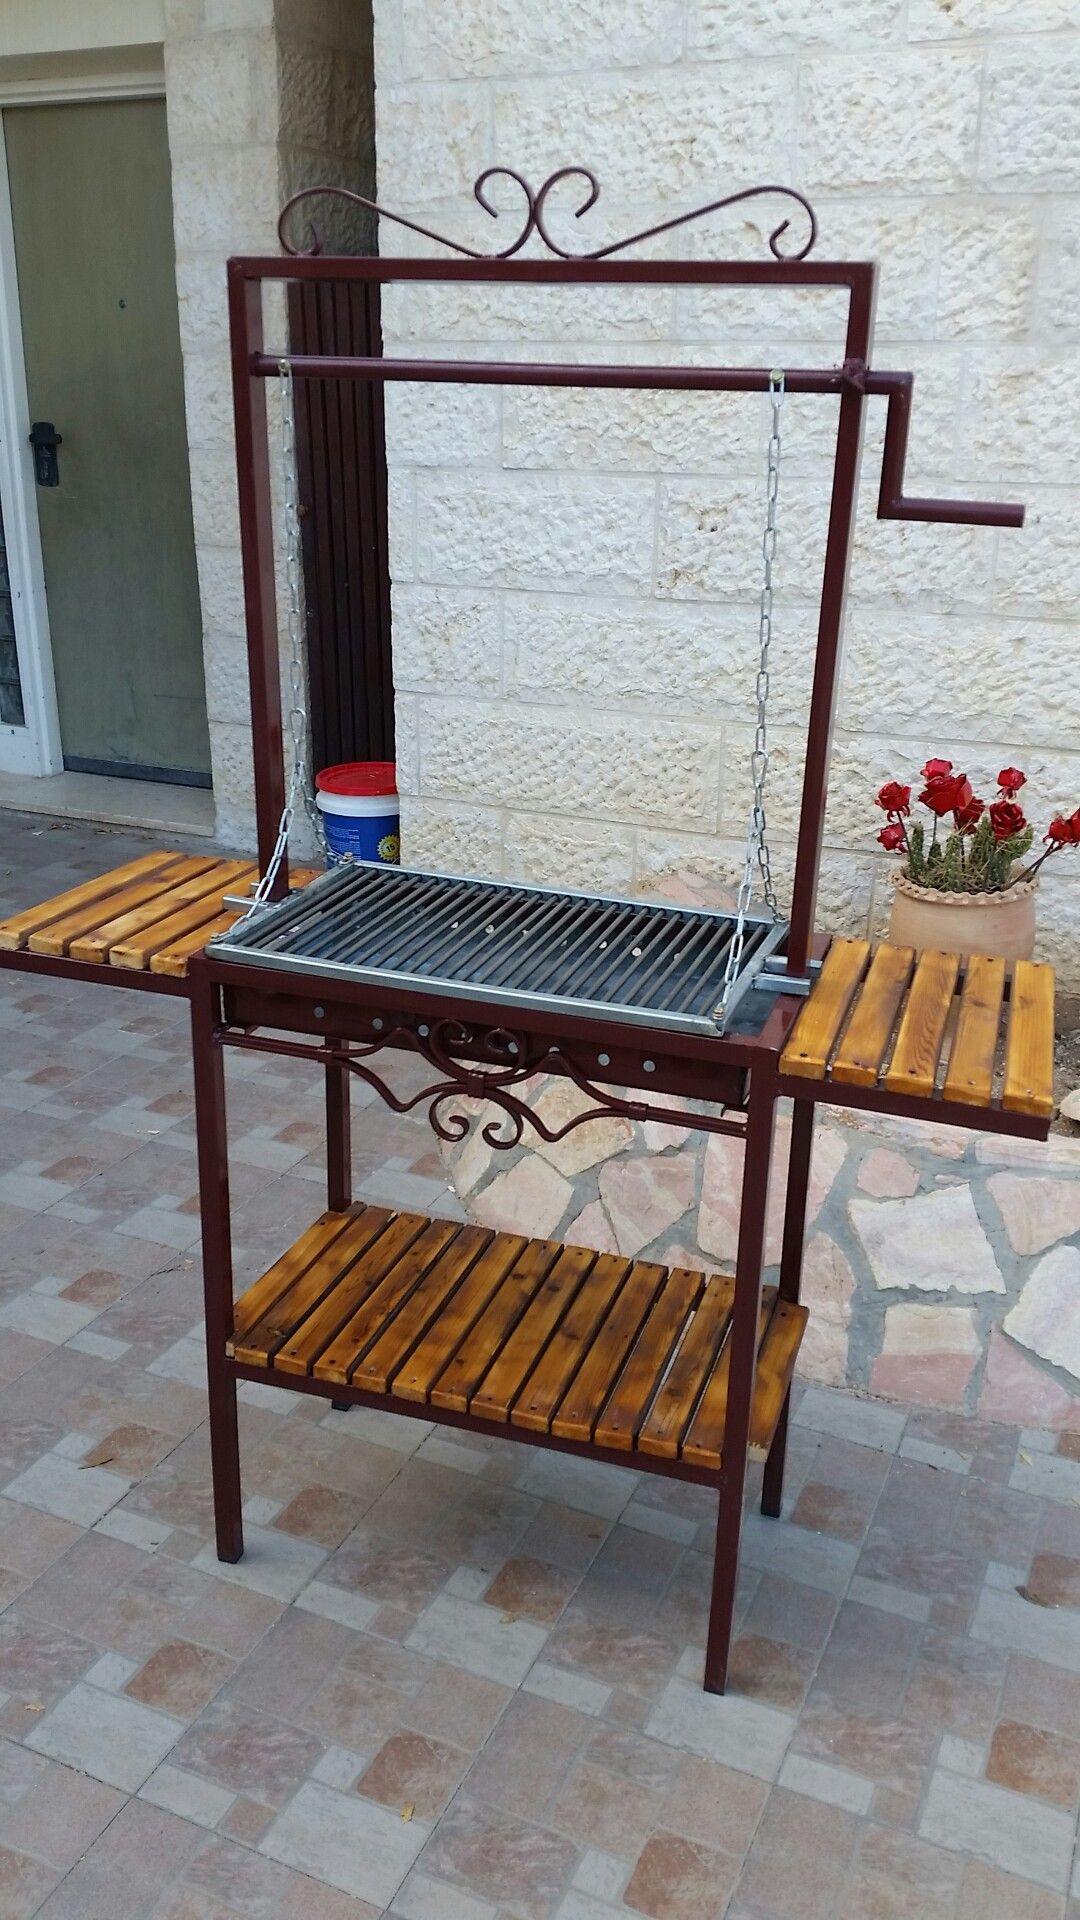 Pin By Shlomi Levi On Diy Bbq Diy Bbq Dining Chairs Decor